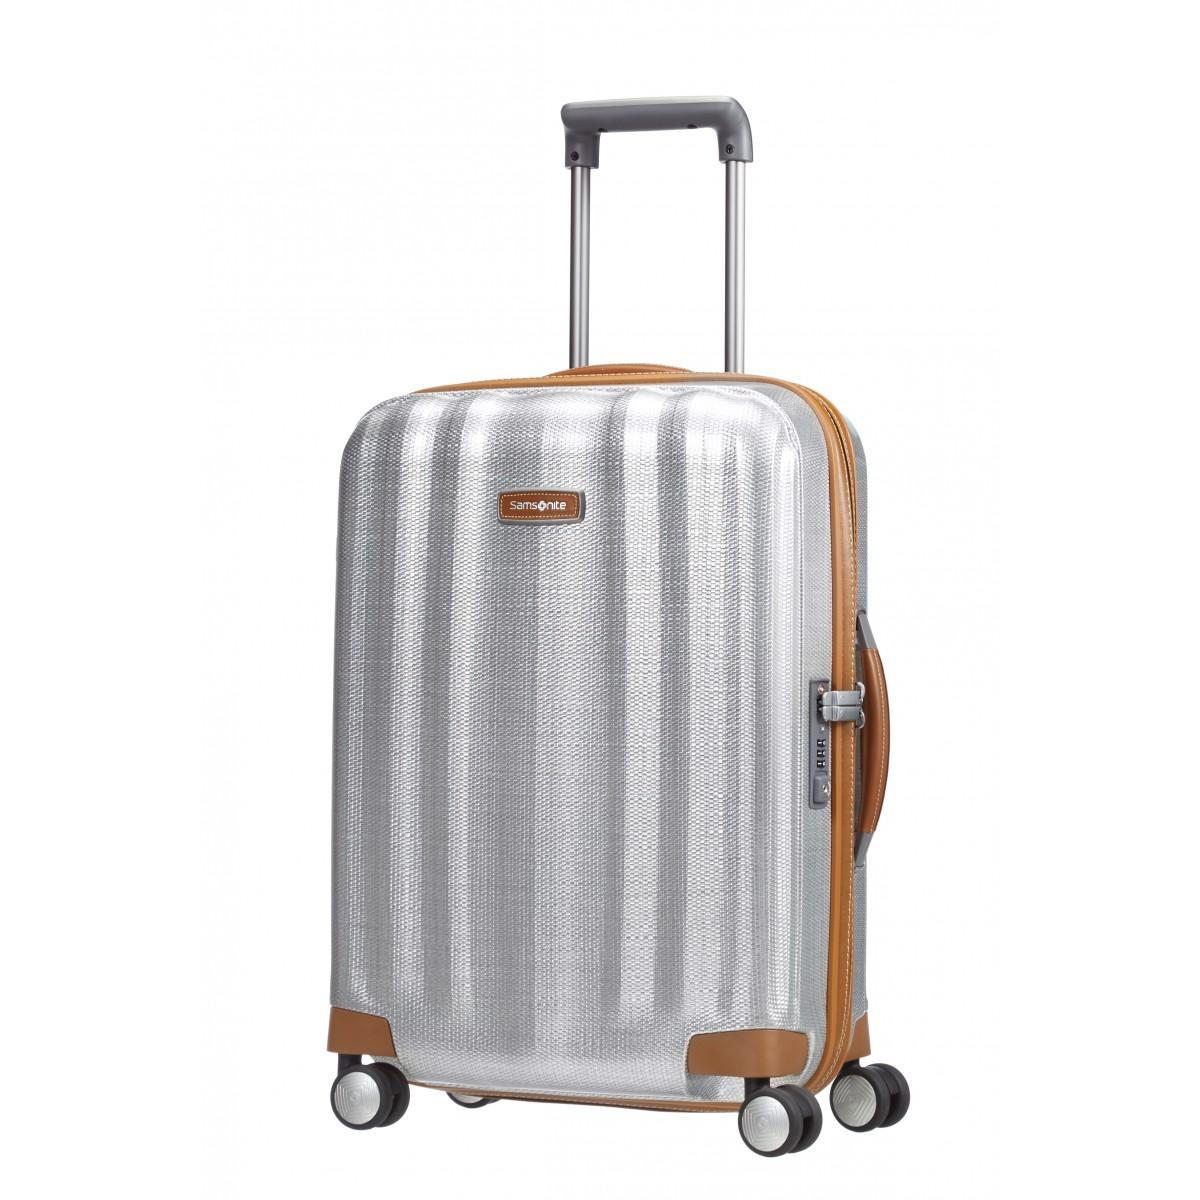 valise lacoste